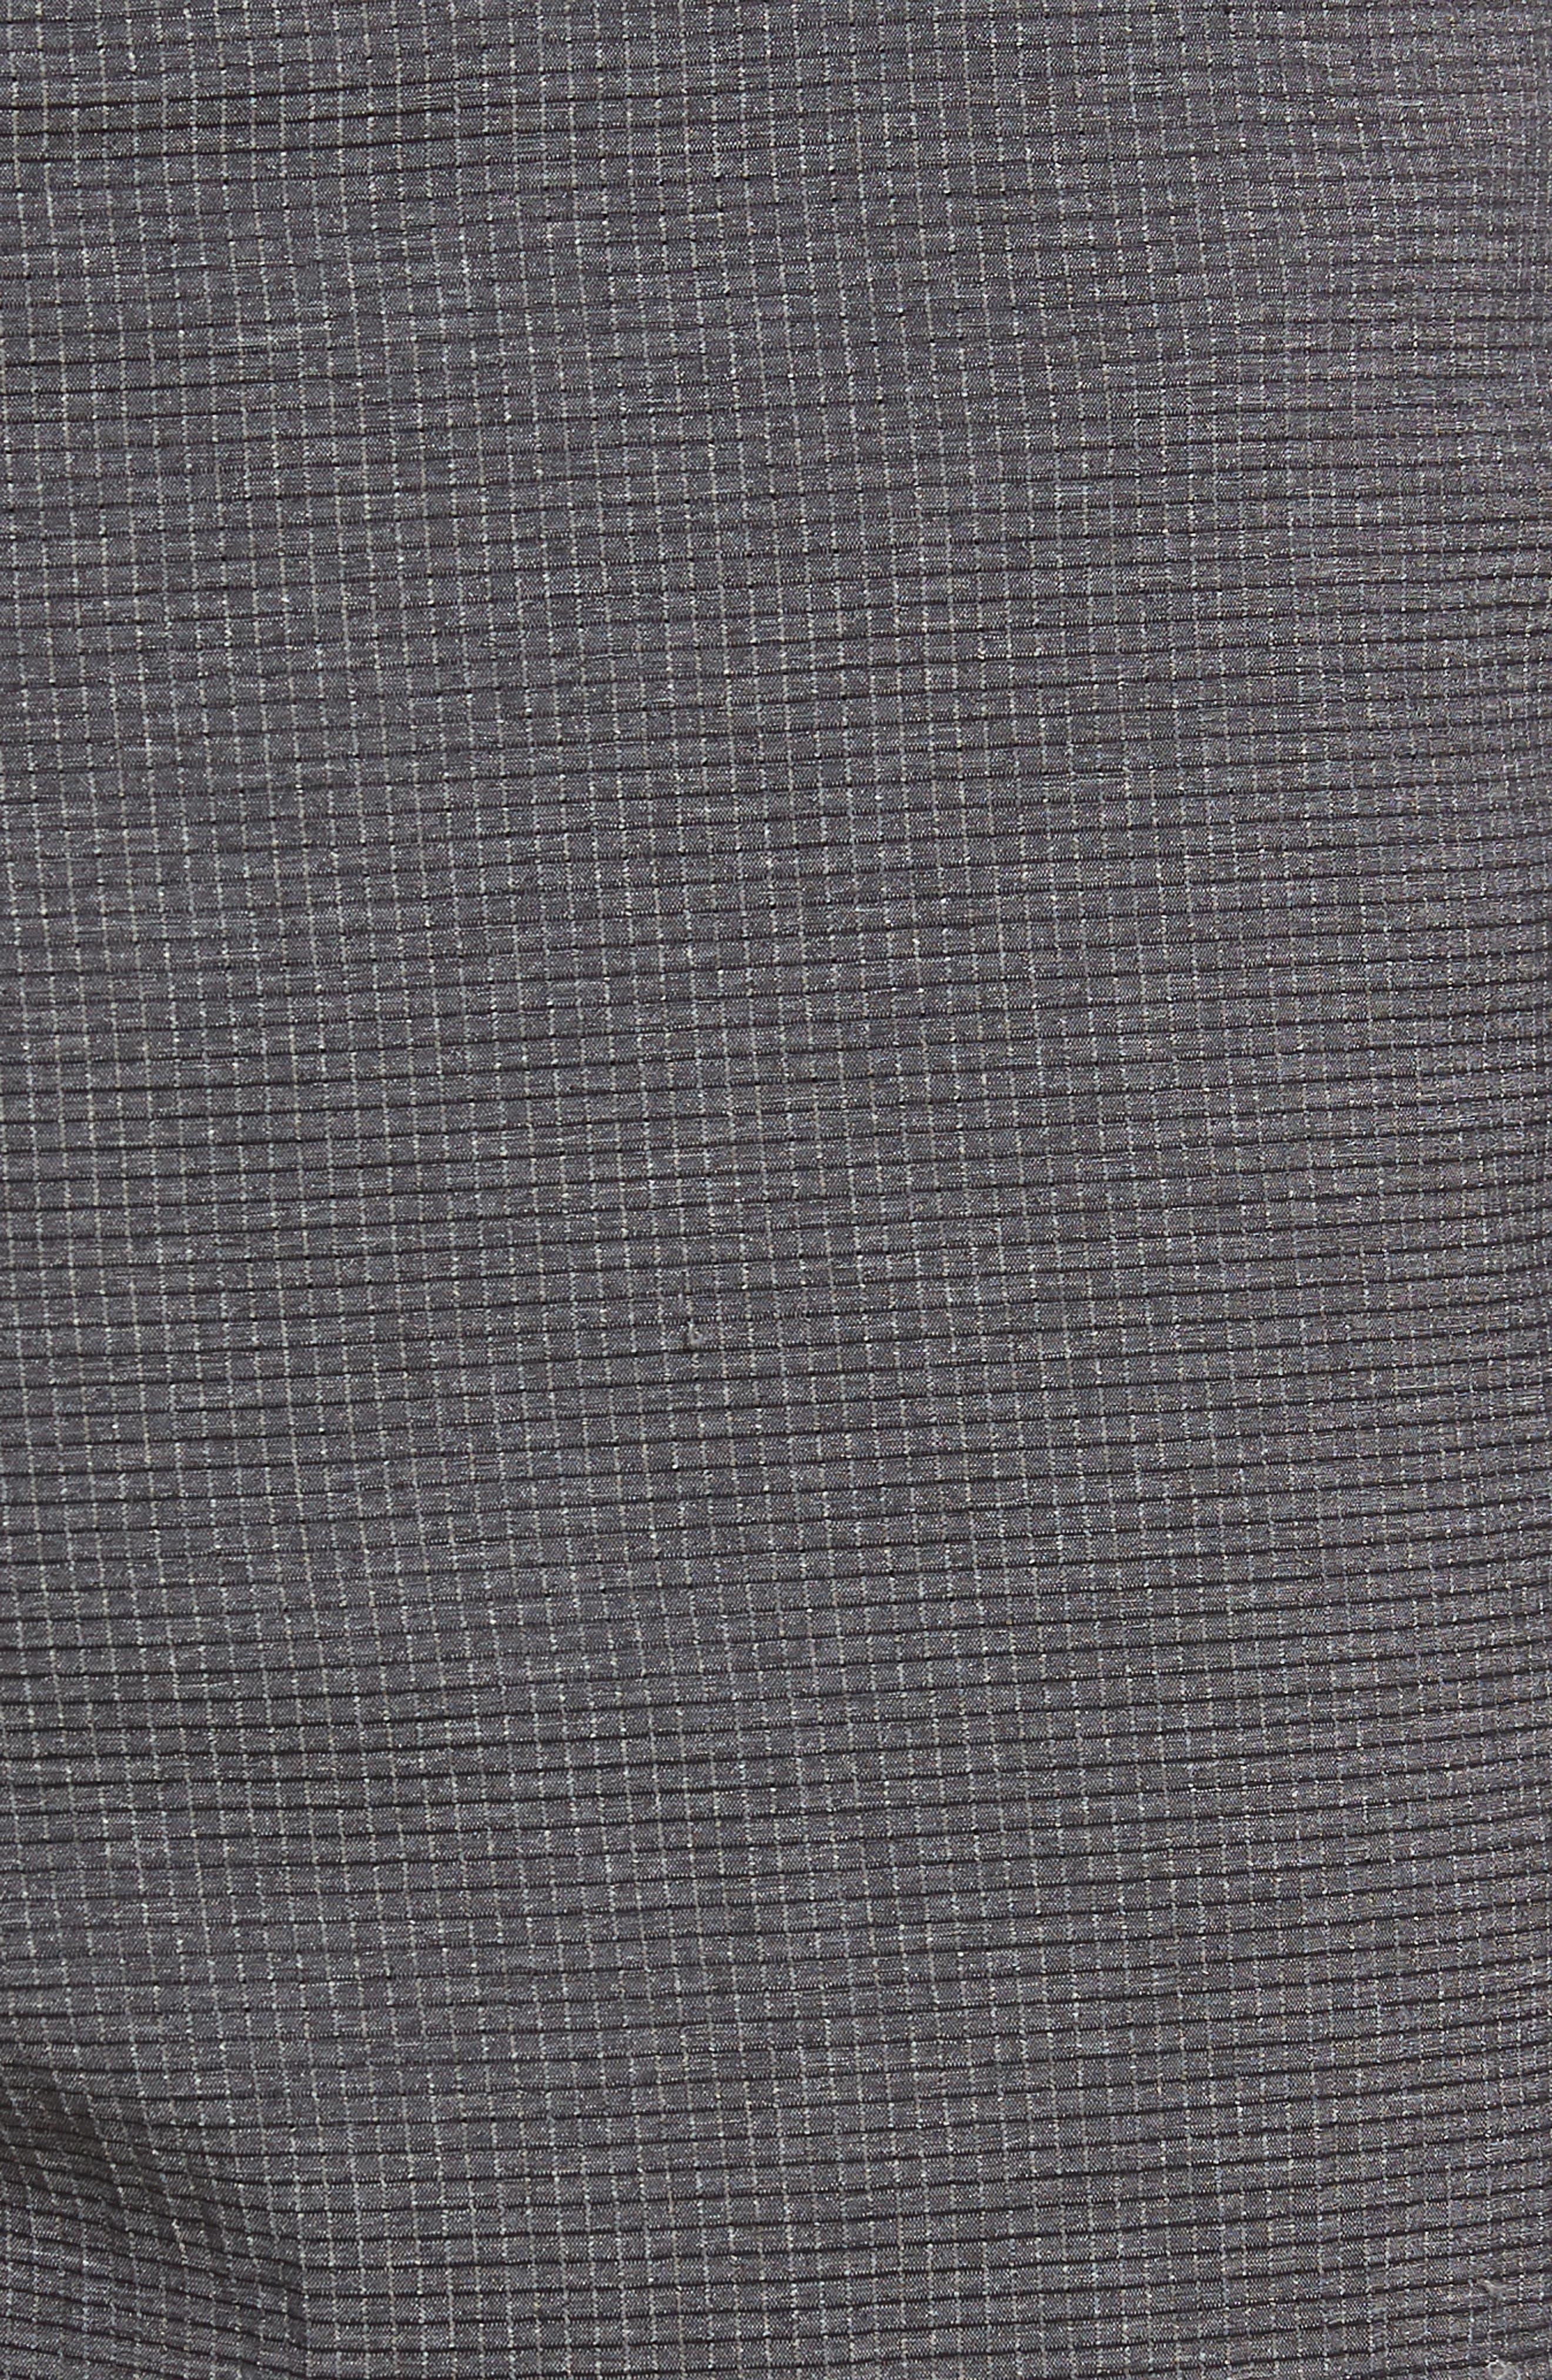 Peel Out Shorts,                             Alternate thumbnail 5, color,                             GREY PINSTRIPE